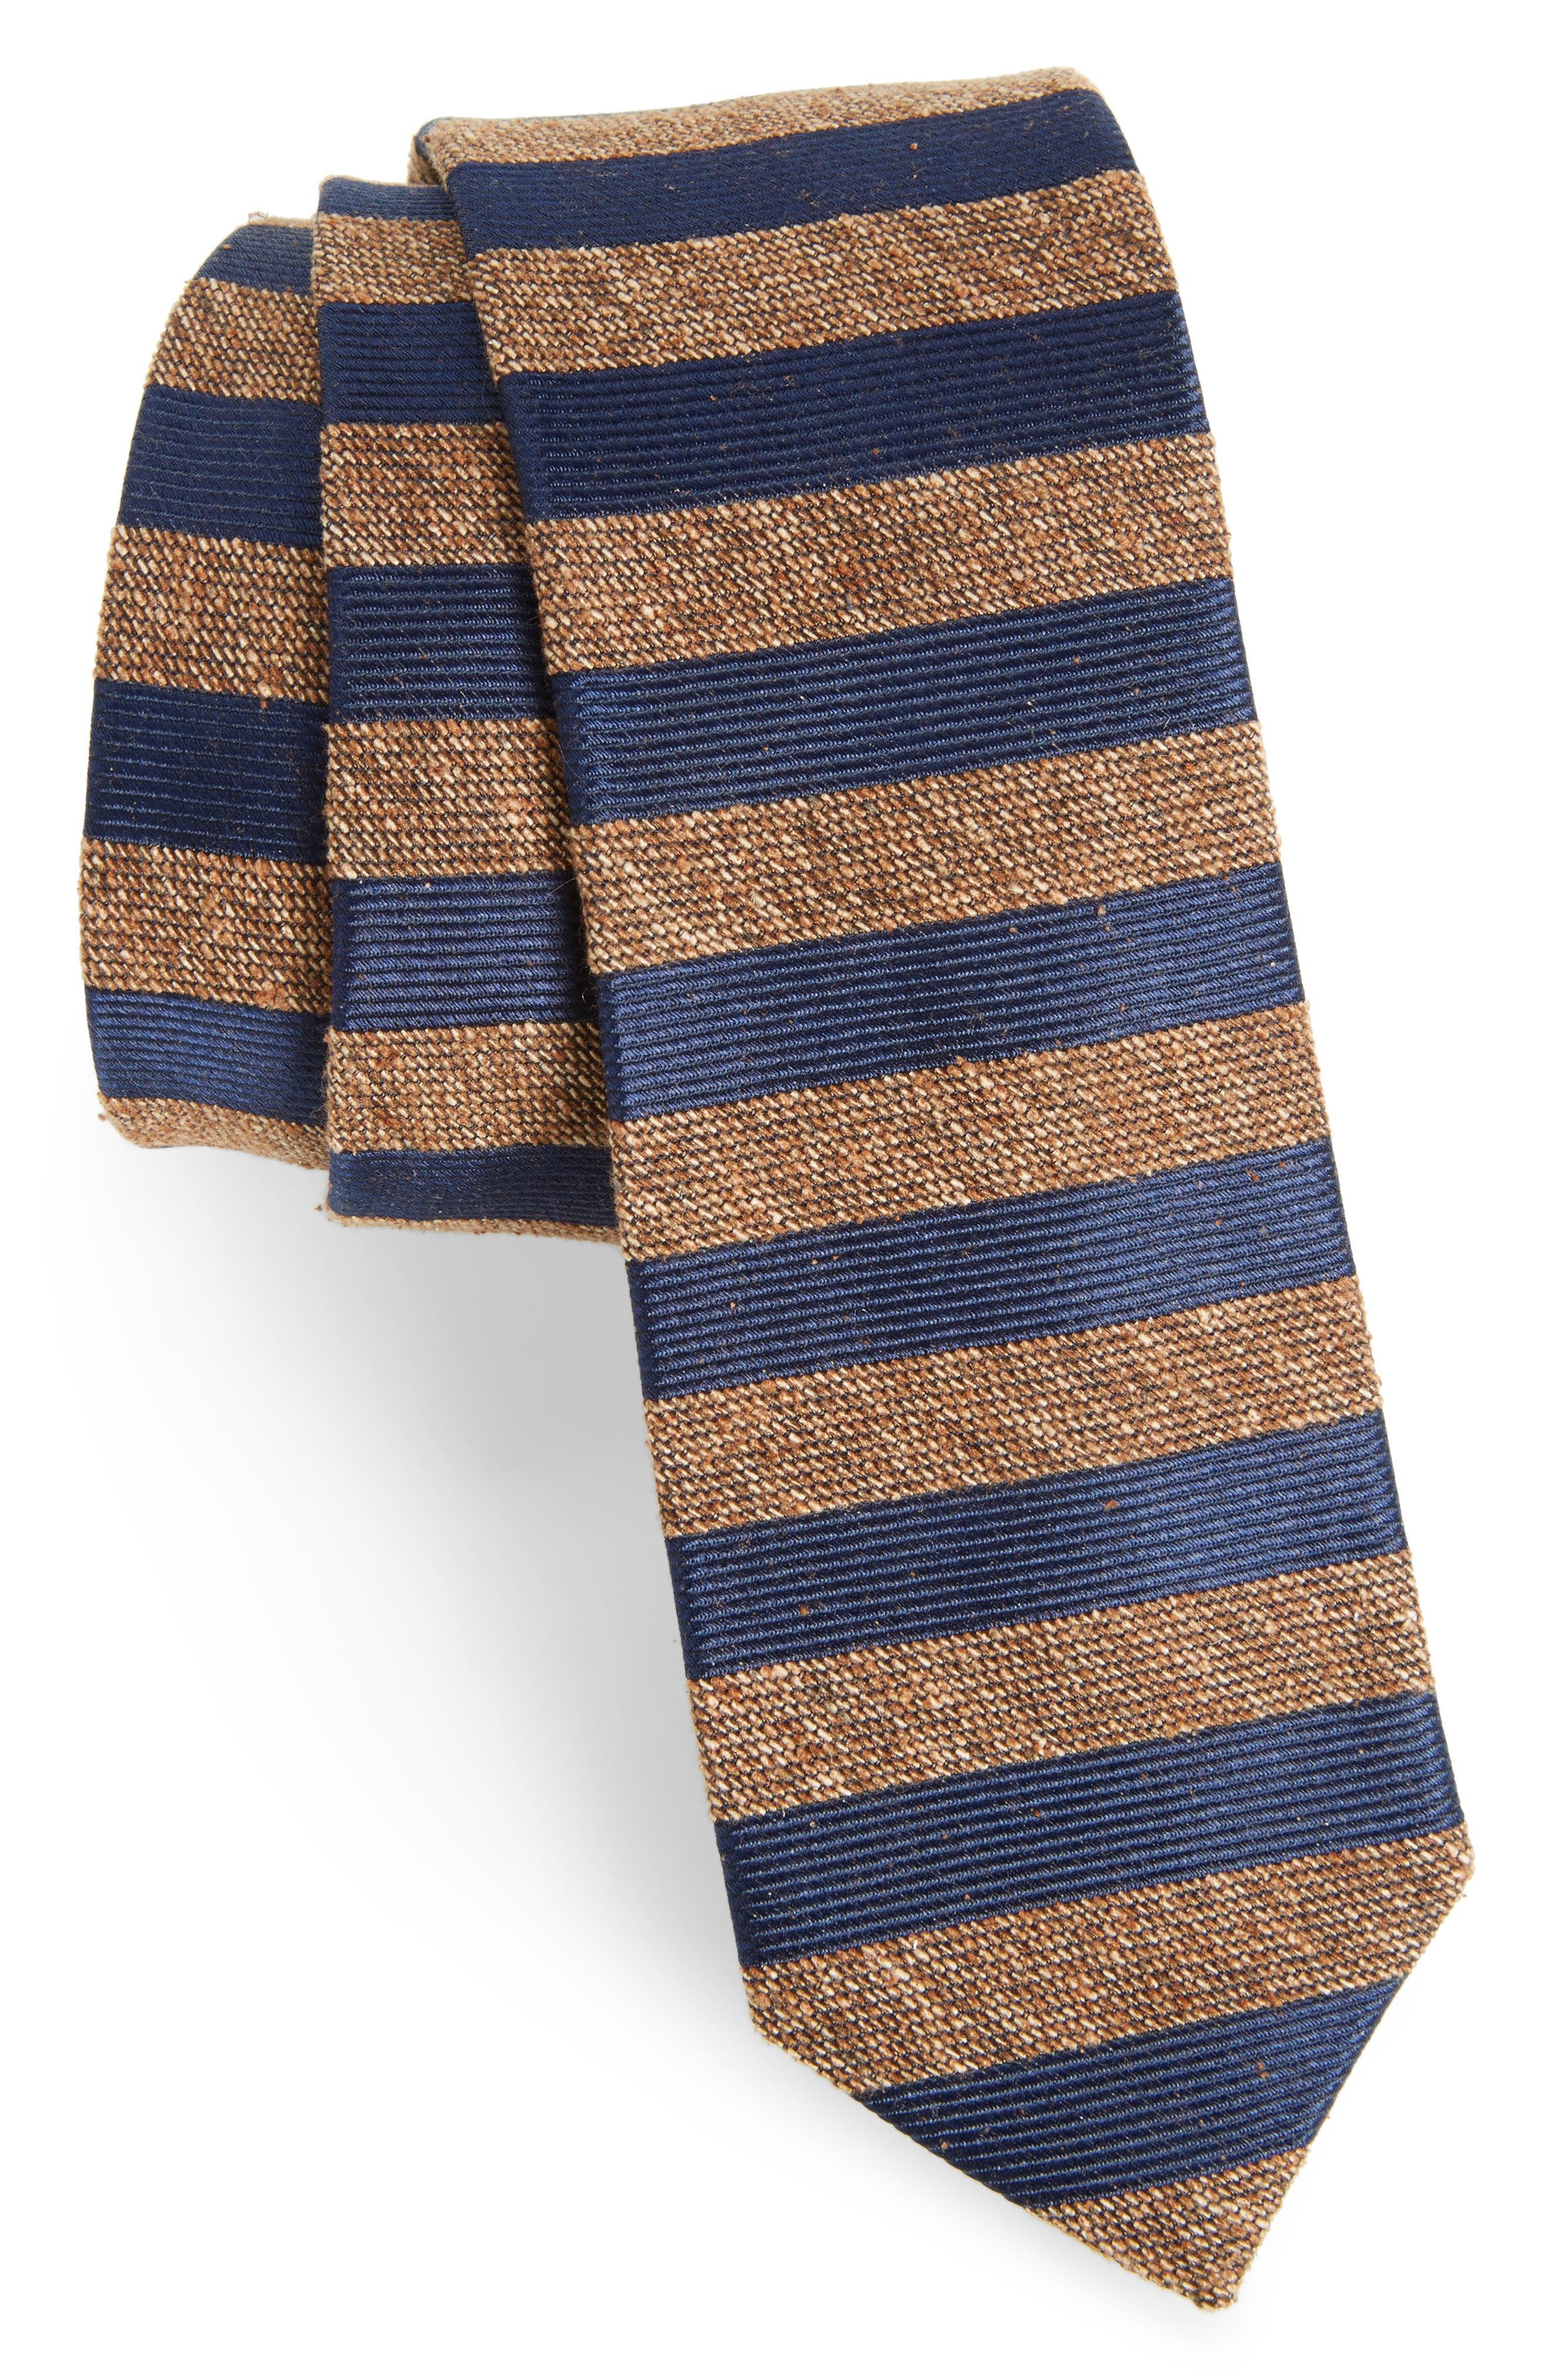 Meter Stripe Nep Silk Tie,                             Main thumbnail 1, color,                             200